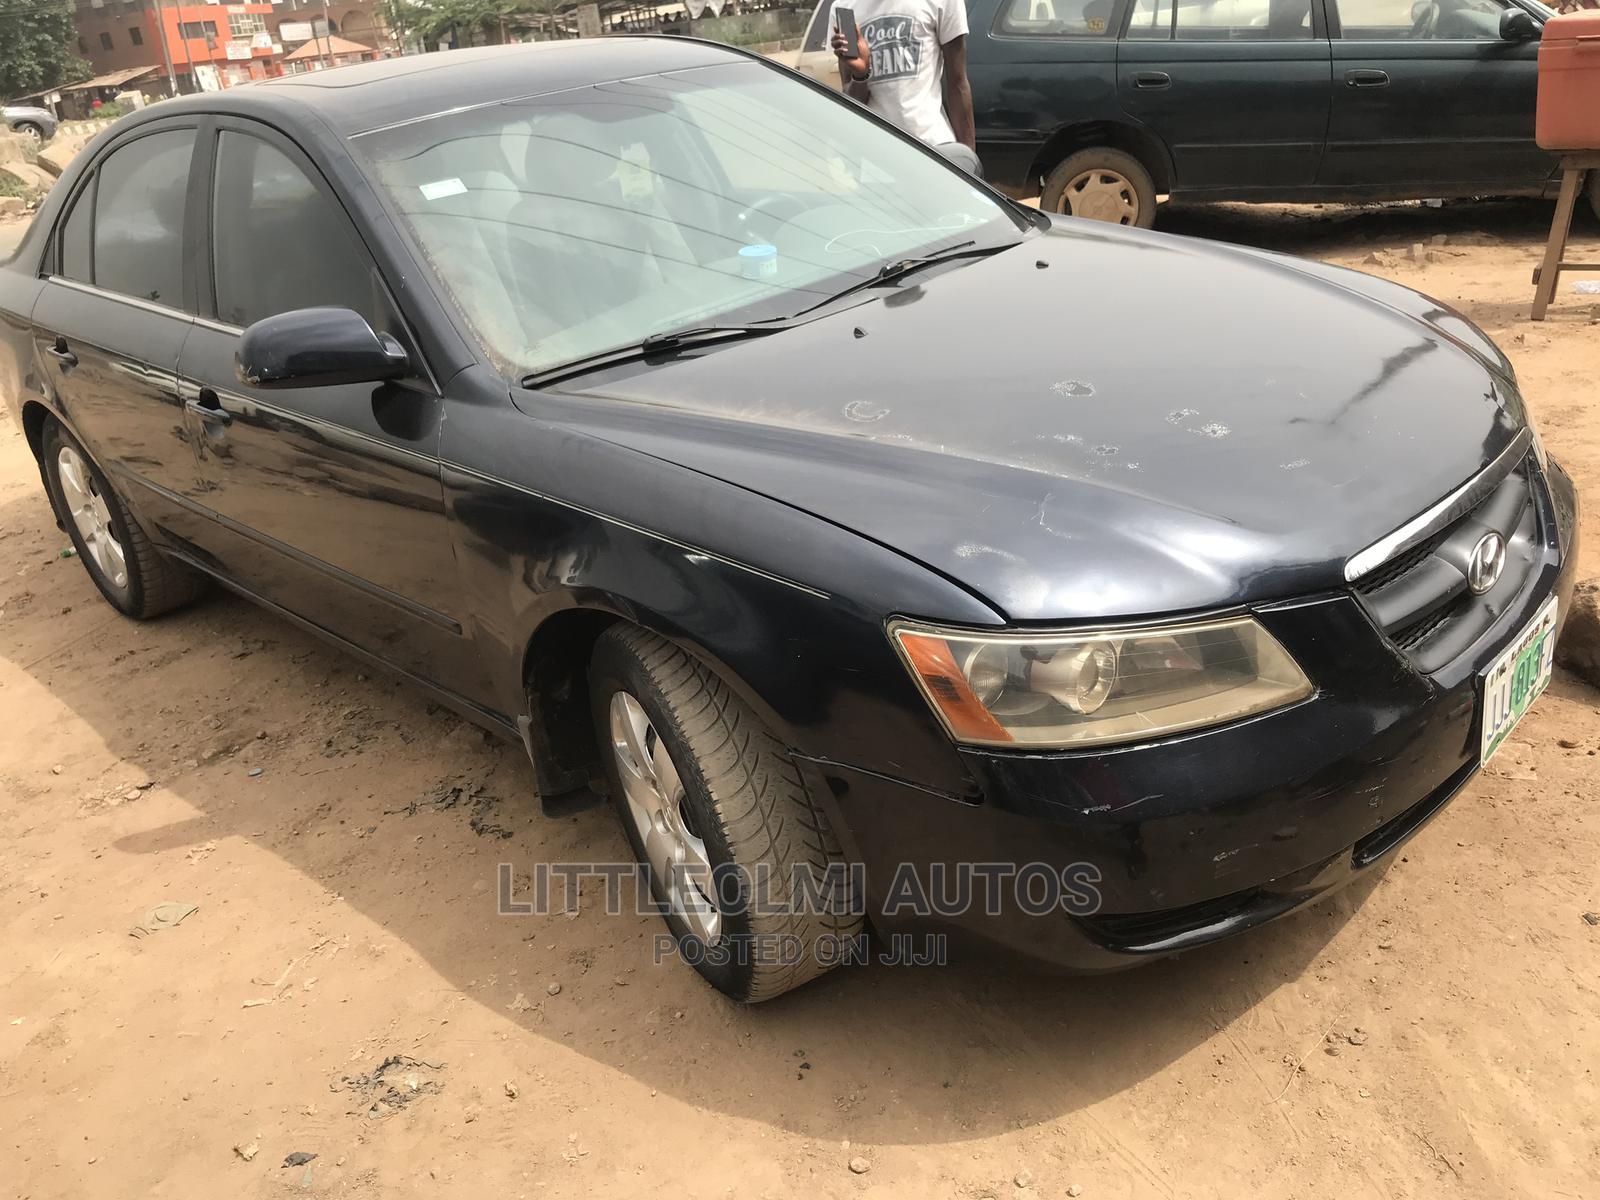 Hyundai Sonata 2006 2.4 GLS Black   Cars for sale in Ifako-Ijaiye, Lagos State, Nigeria